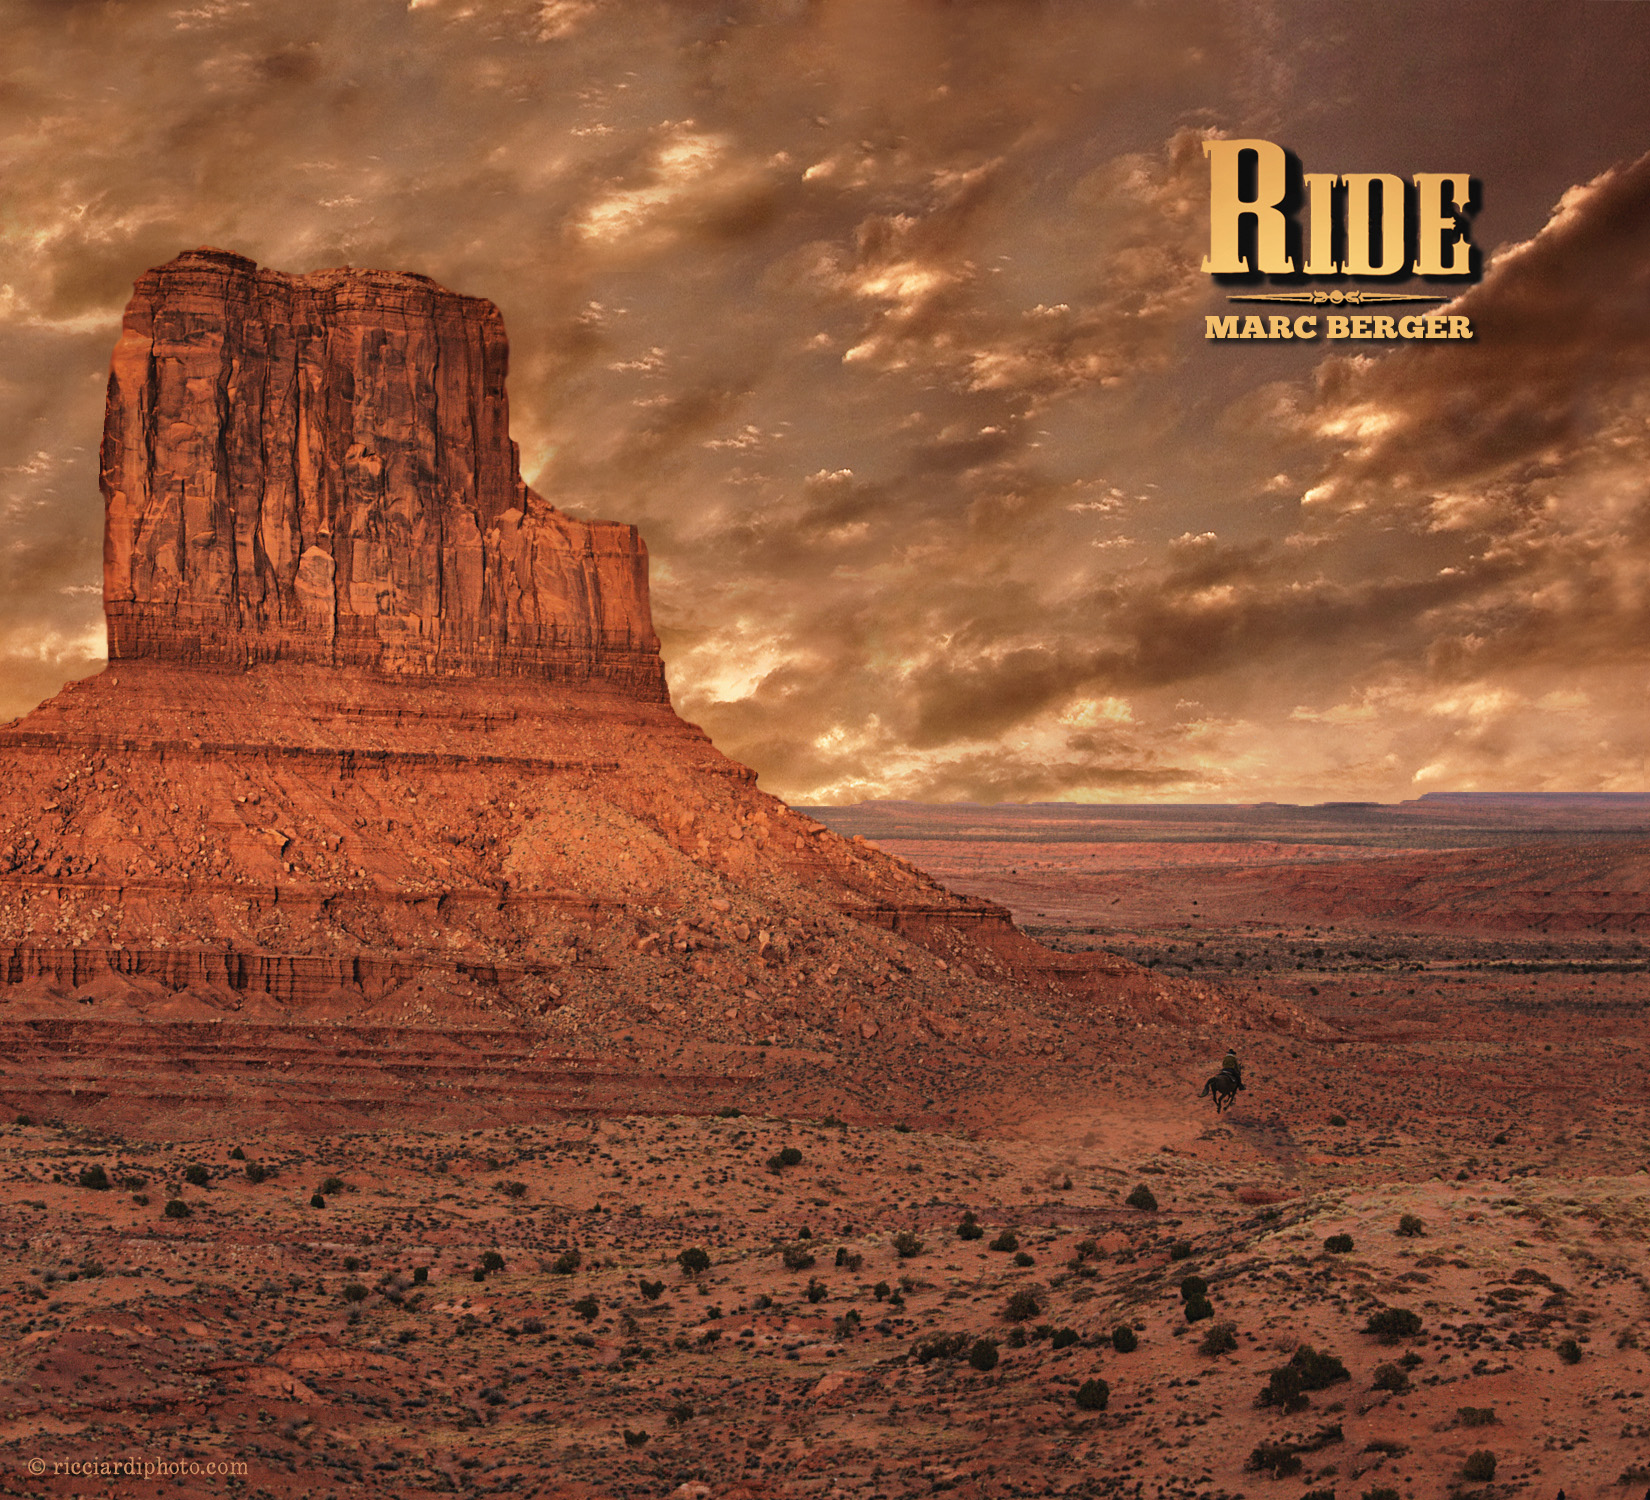 Marc Berger - Ride